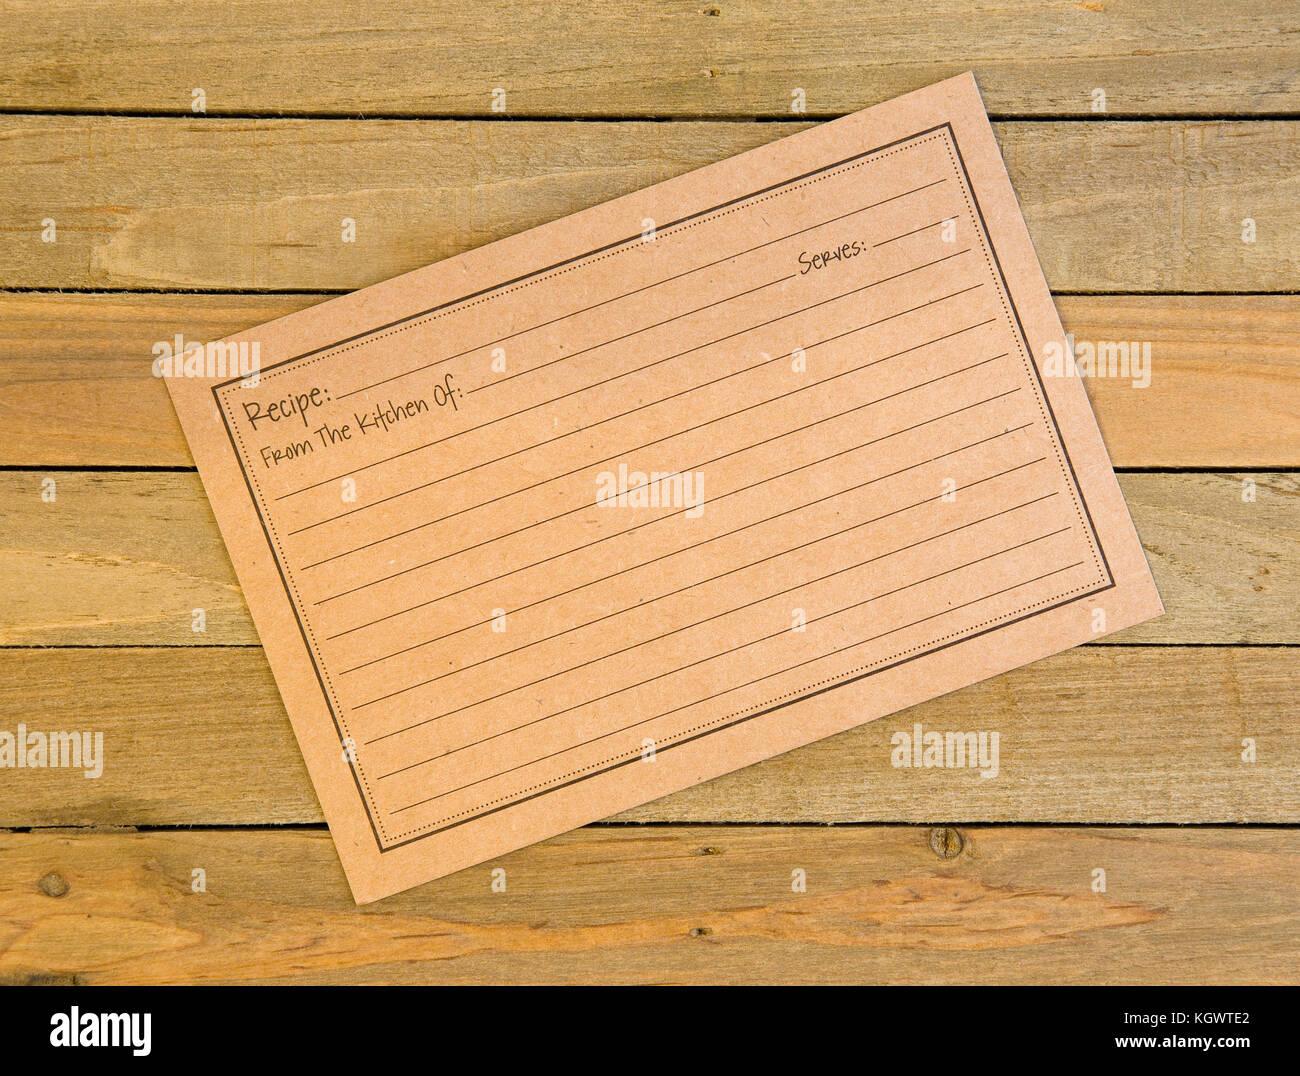 Recipe Card Stockfotos & Recipe Card Bilder - Alamy